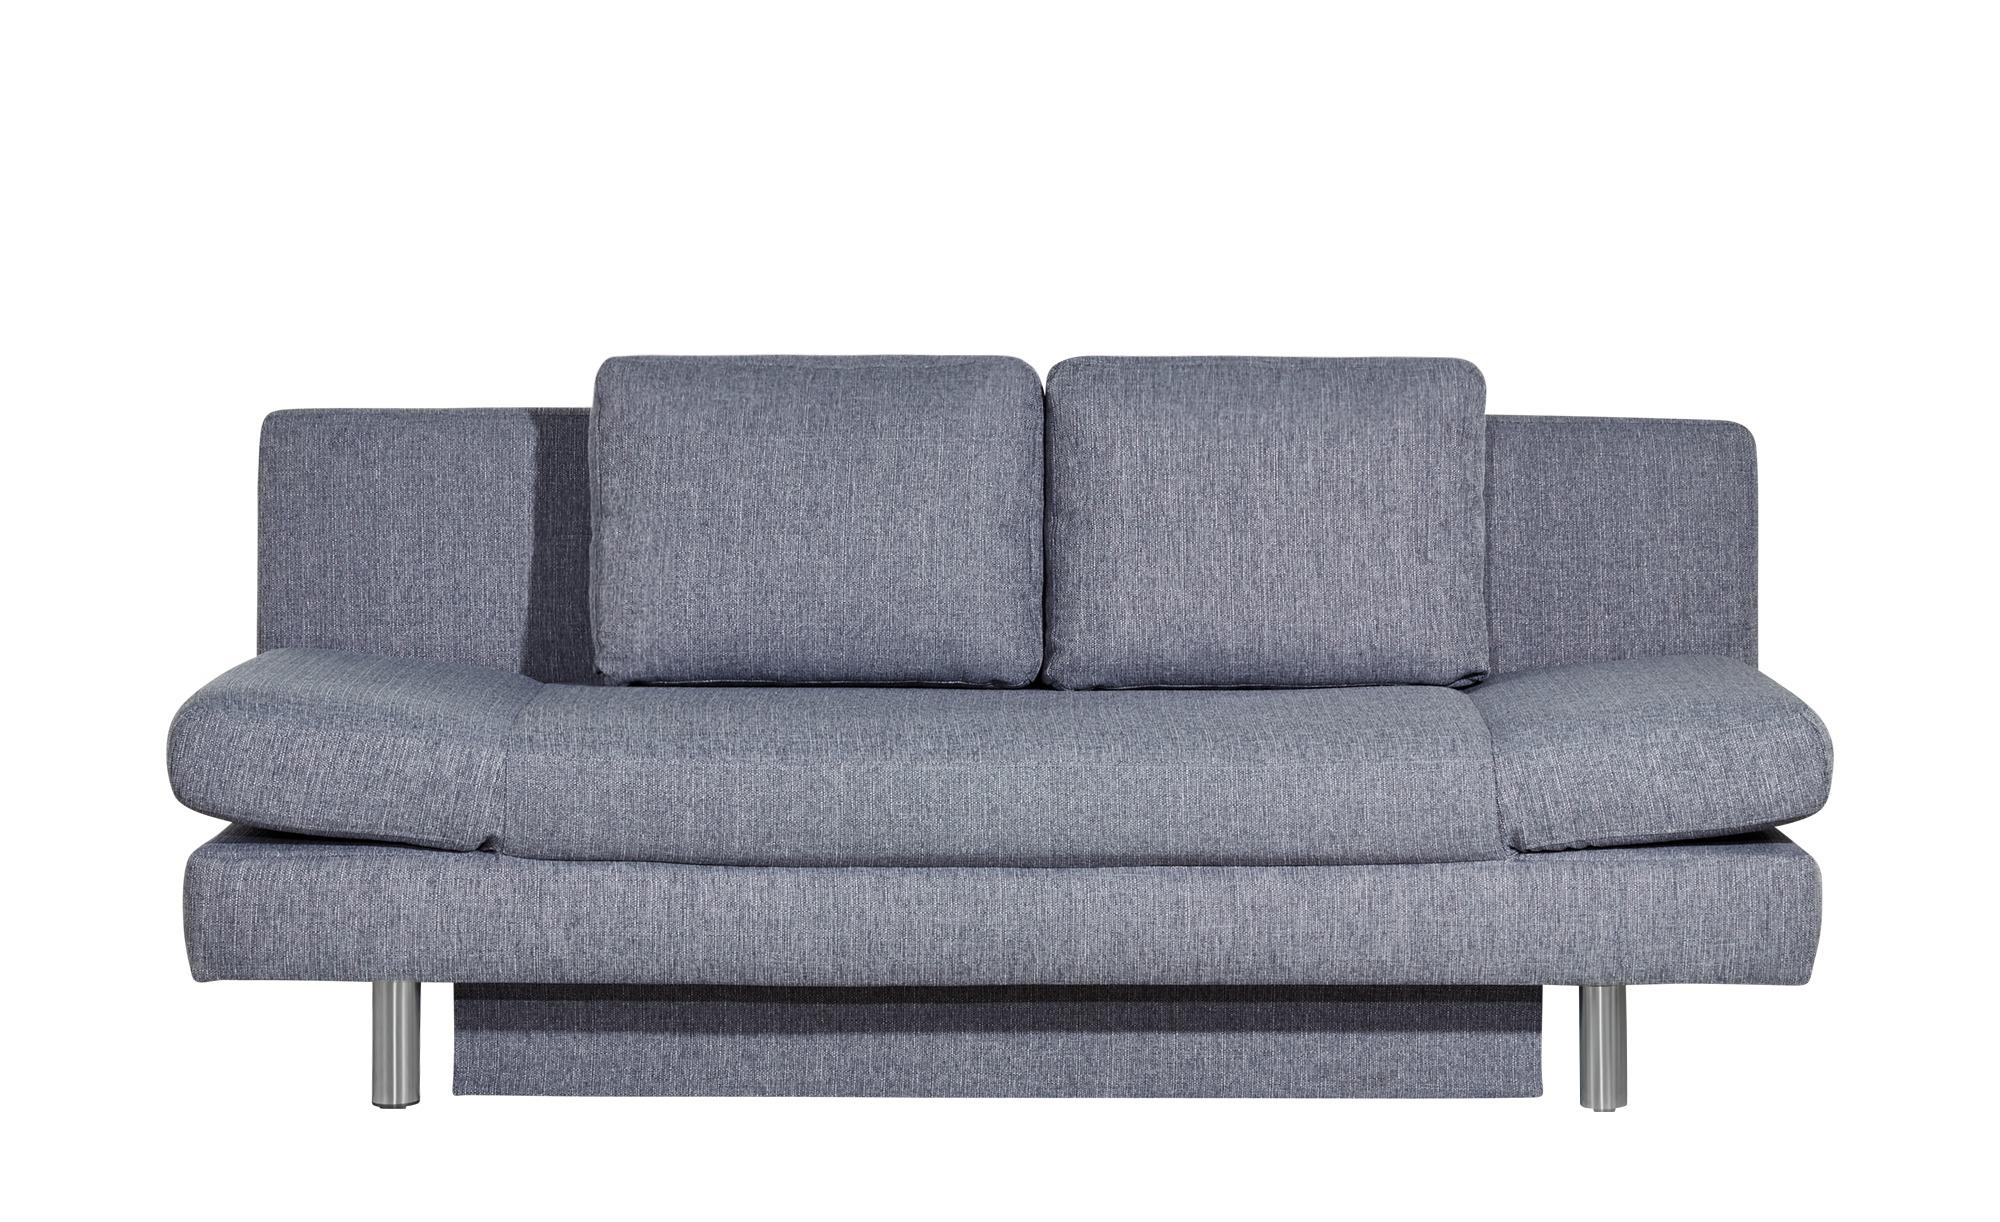 smart Schlafsofa grau - Webstoff Nina ¦ grau ¦ Maße (cm): B: 205 H: 90 T: 95 Polstermöbel > Sofas > 2-Sitzer - Höffner